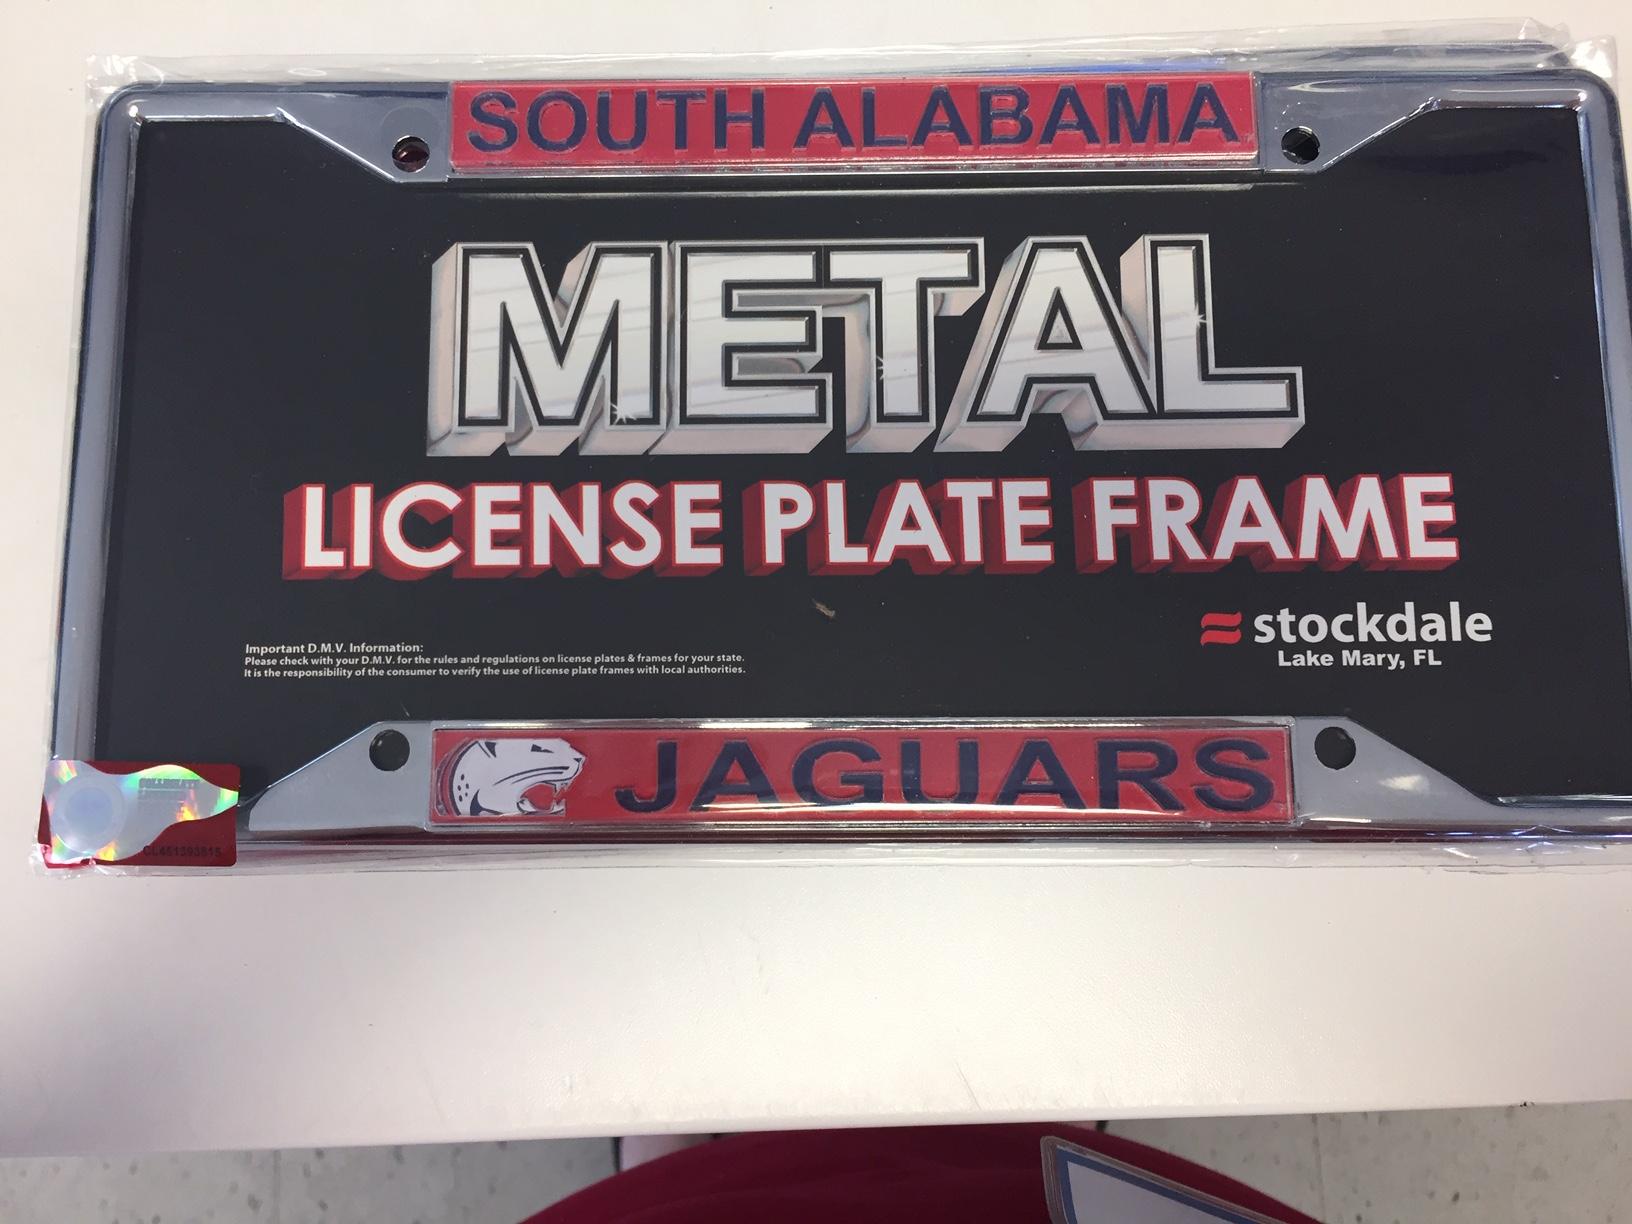 South Alabama License Plate Frame